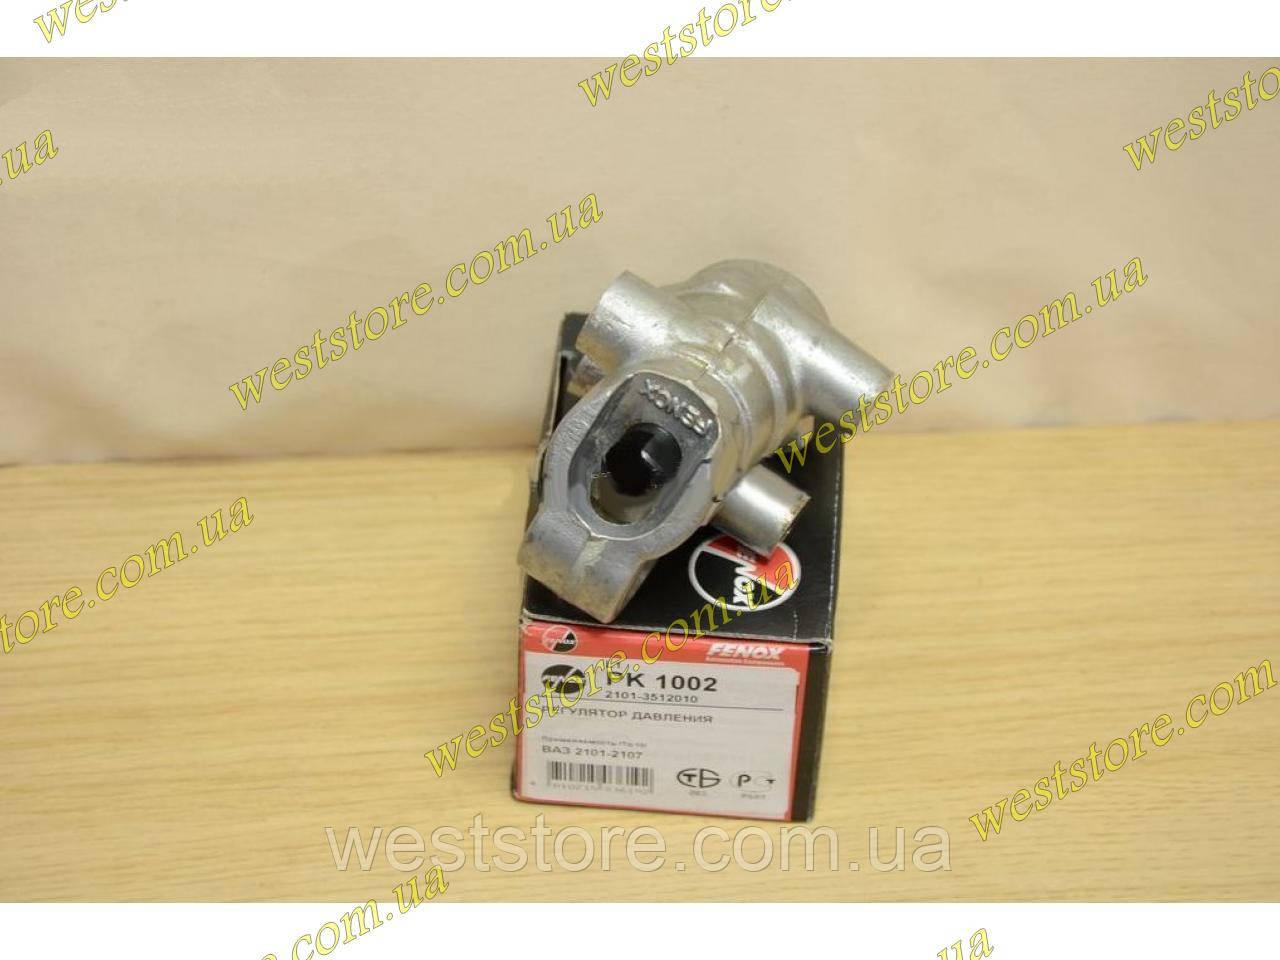 Регулятор давления тормозов (колдун) ваз 2101 2102 2103 2104 2105 2106 2107 Фенокс Fenox PK 1002L1